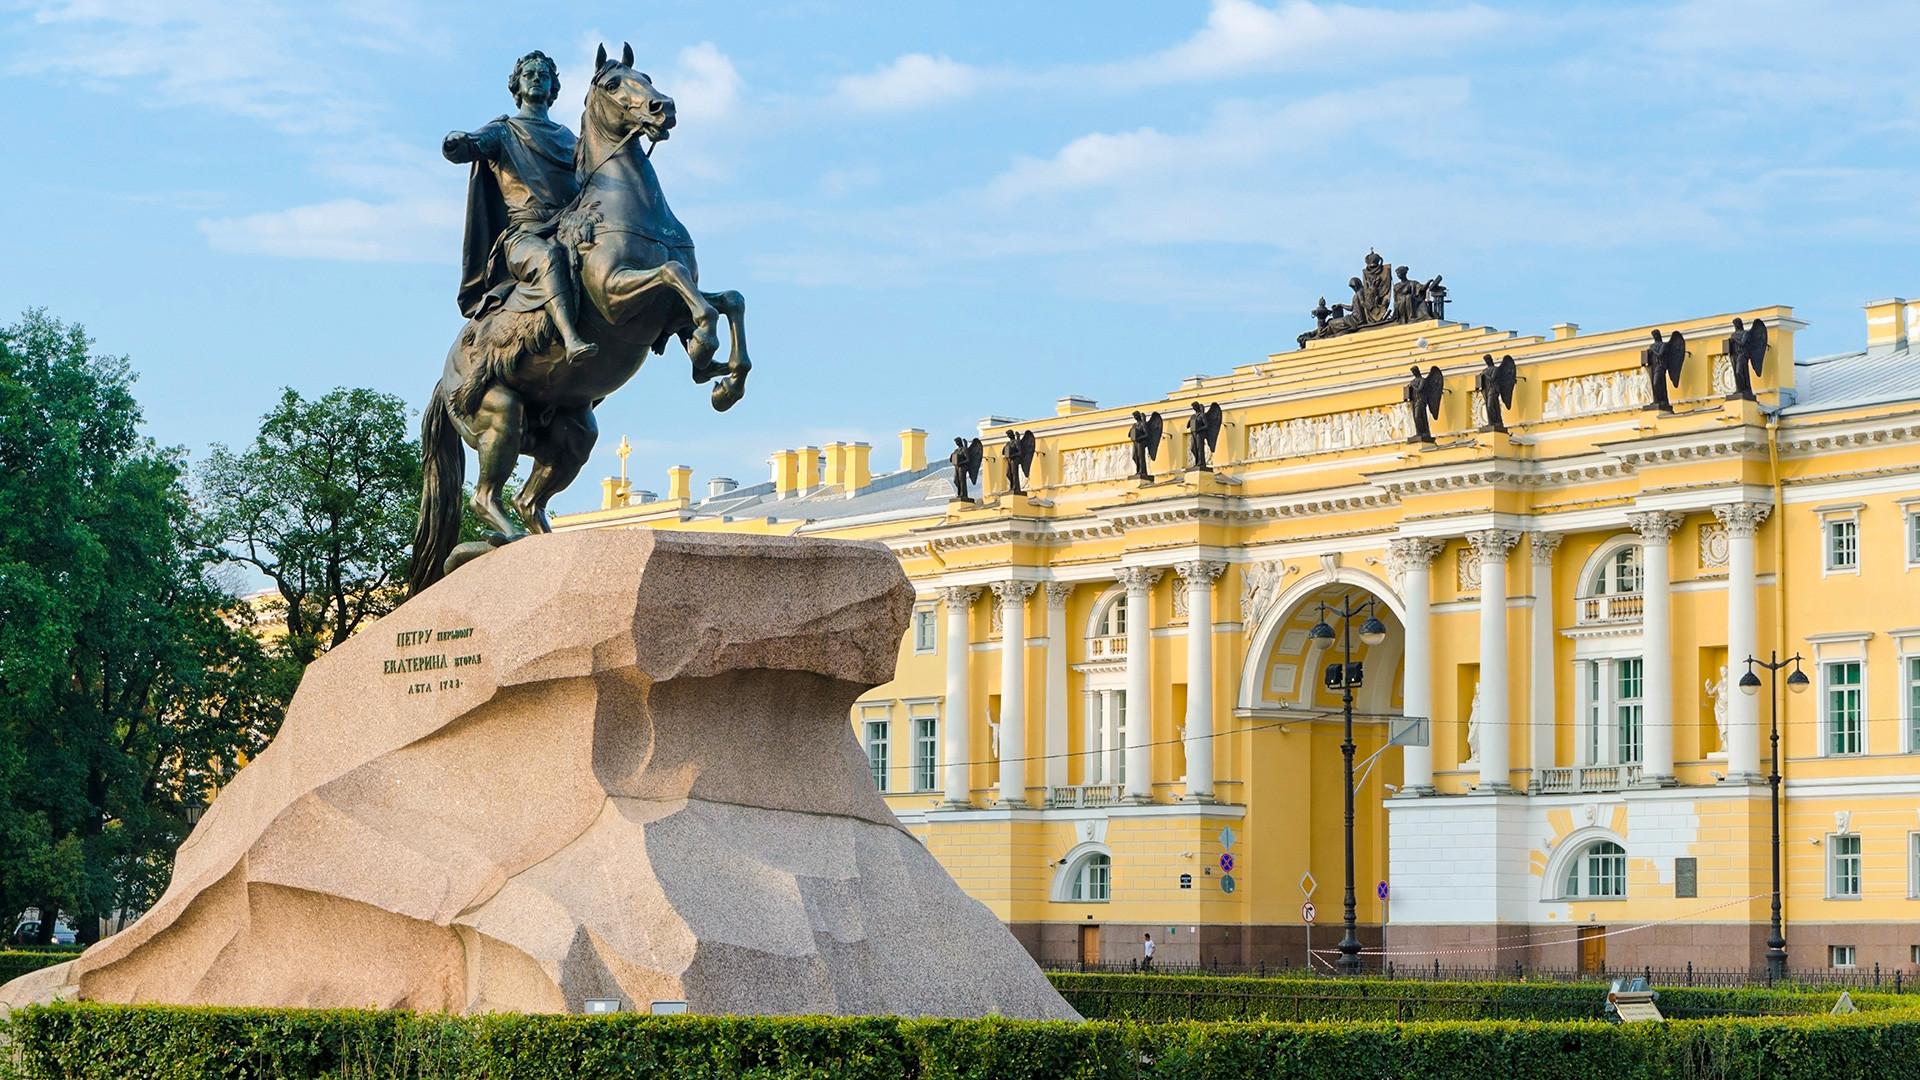 Patung Penunggang Kuda Perunggu, monumen Pyotr yang Agung